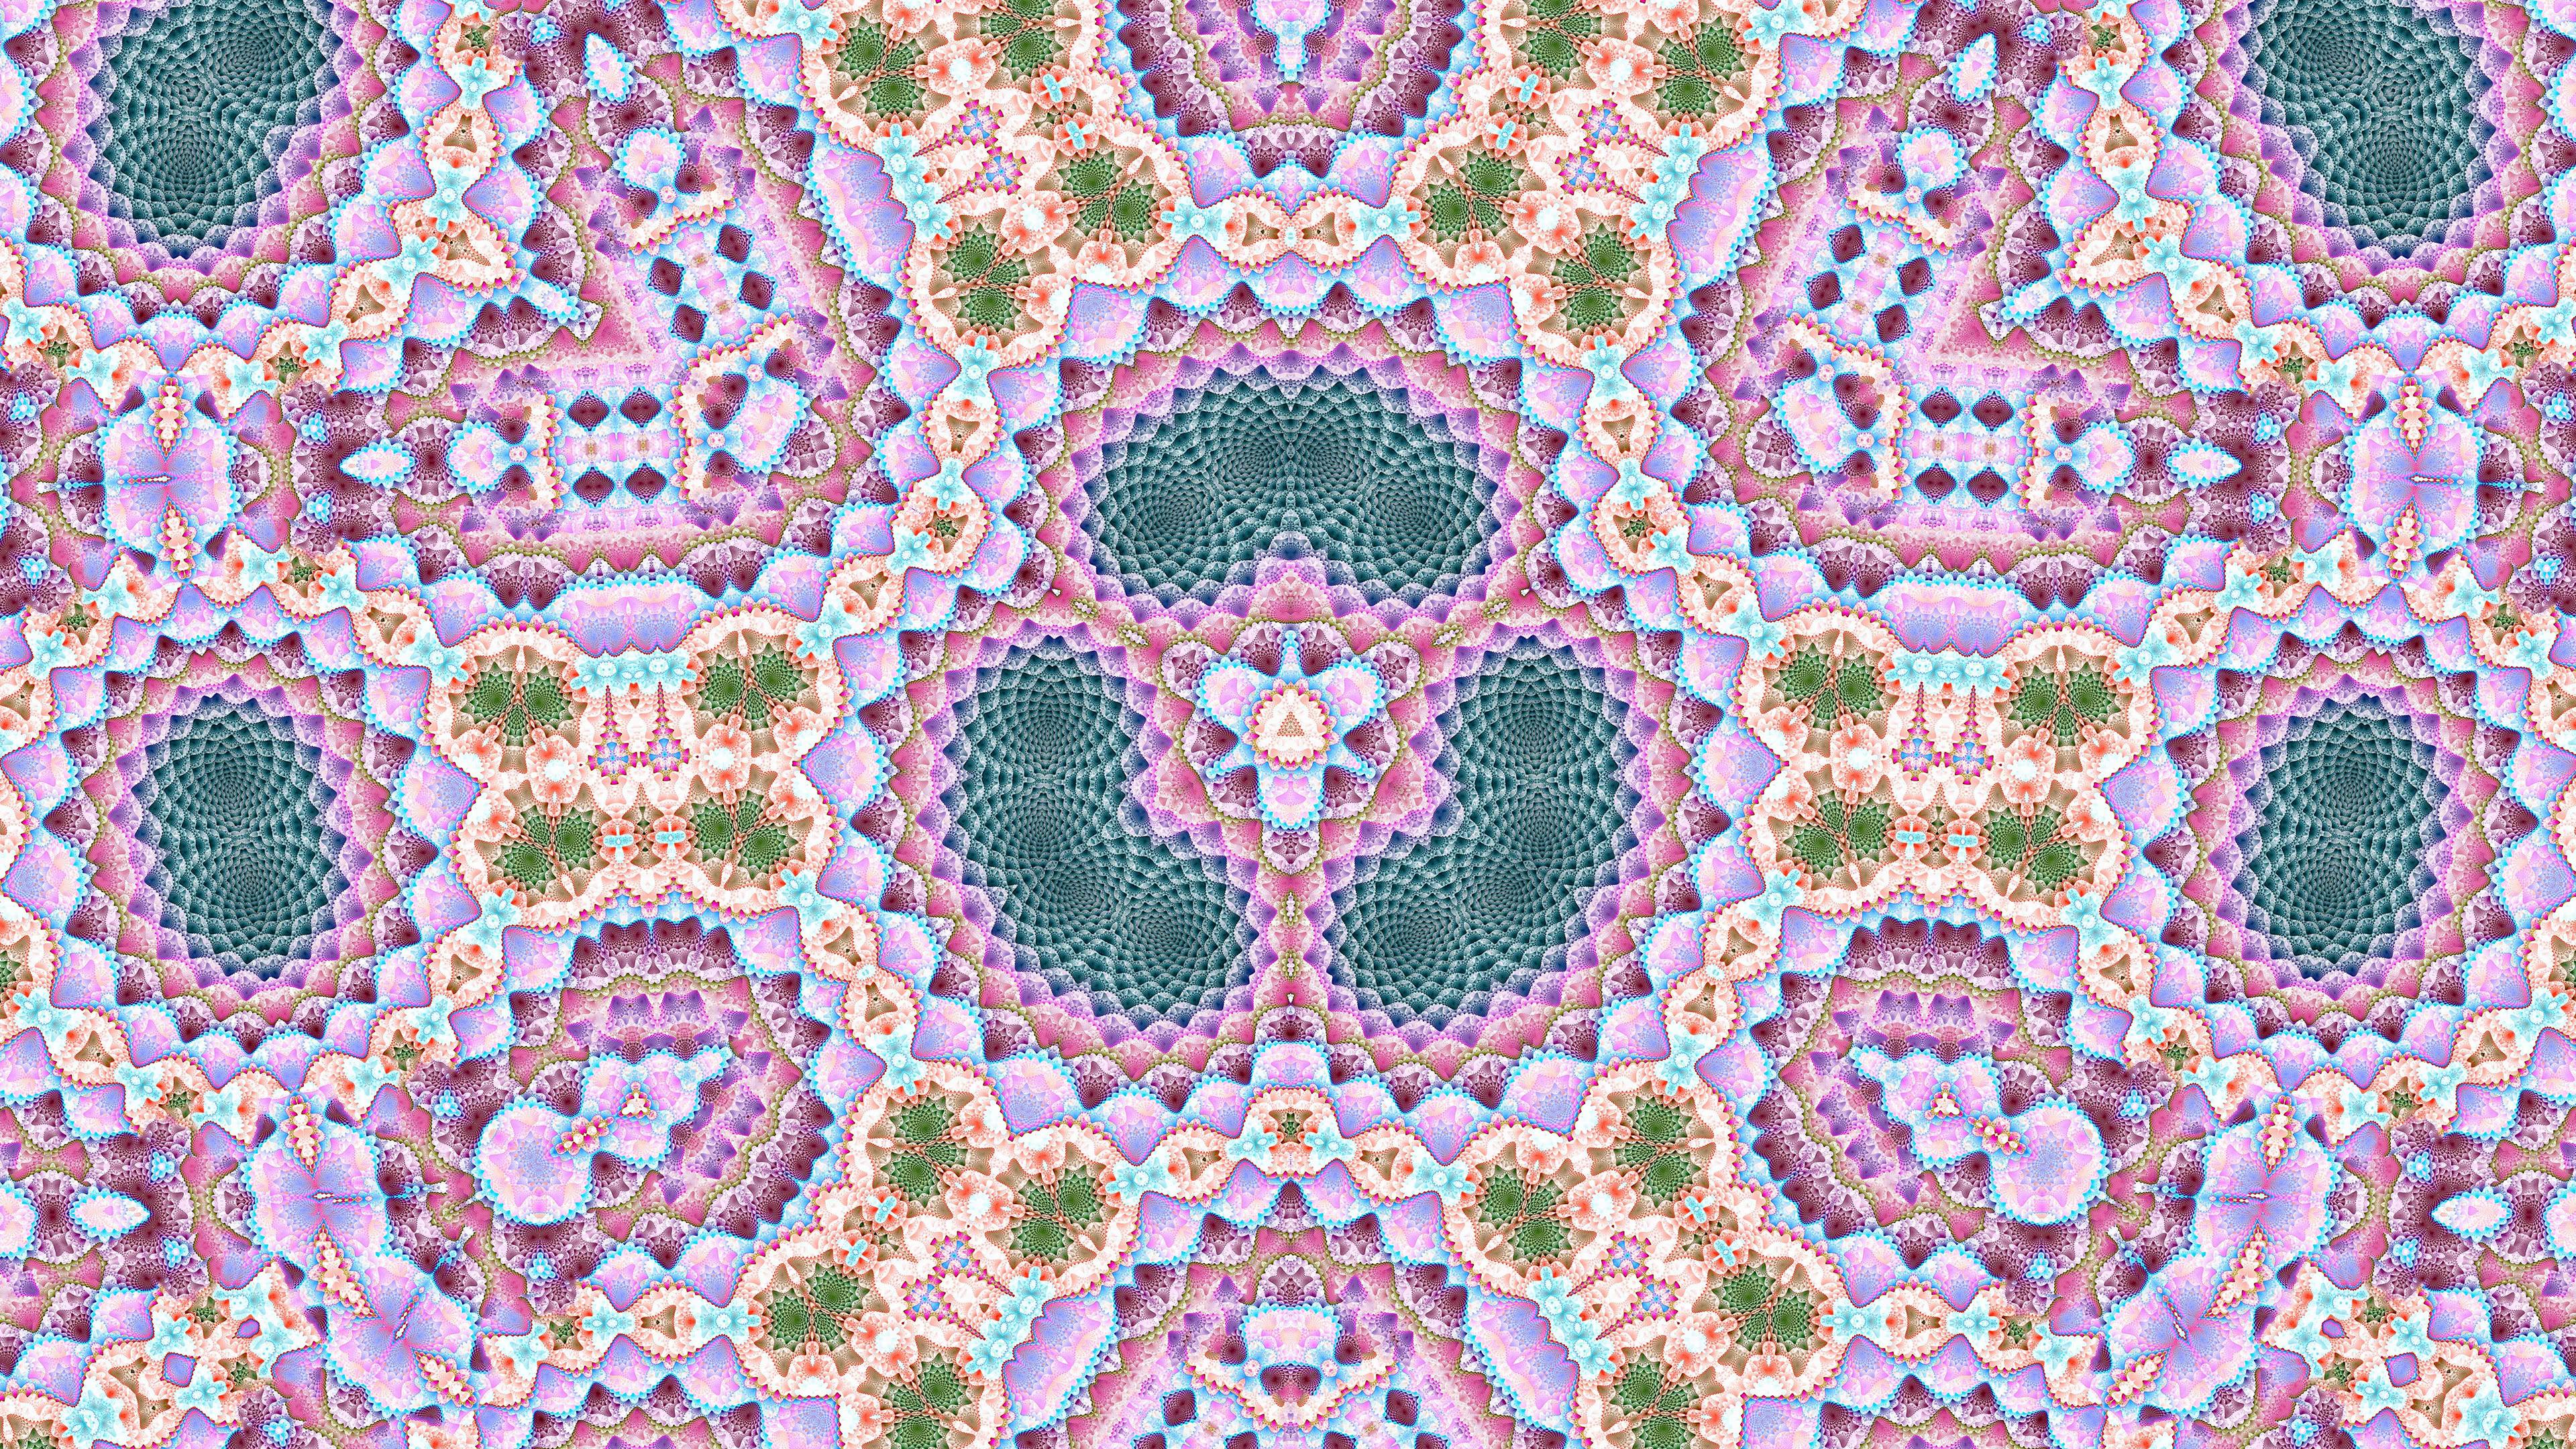 fractal kaleidoscope uhd 4k wallpaper